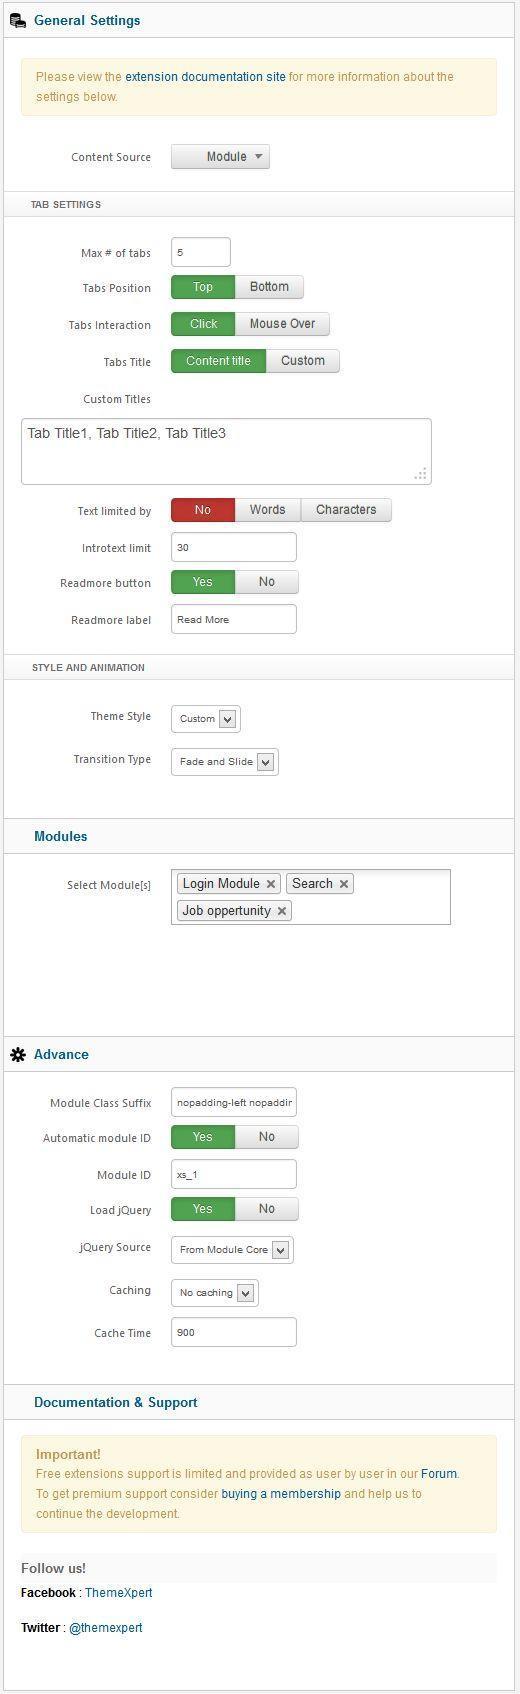 Xpert Tabs settings